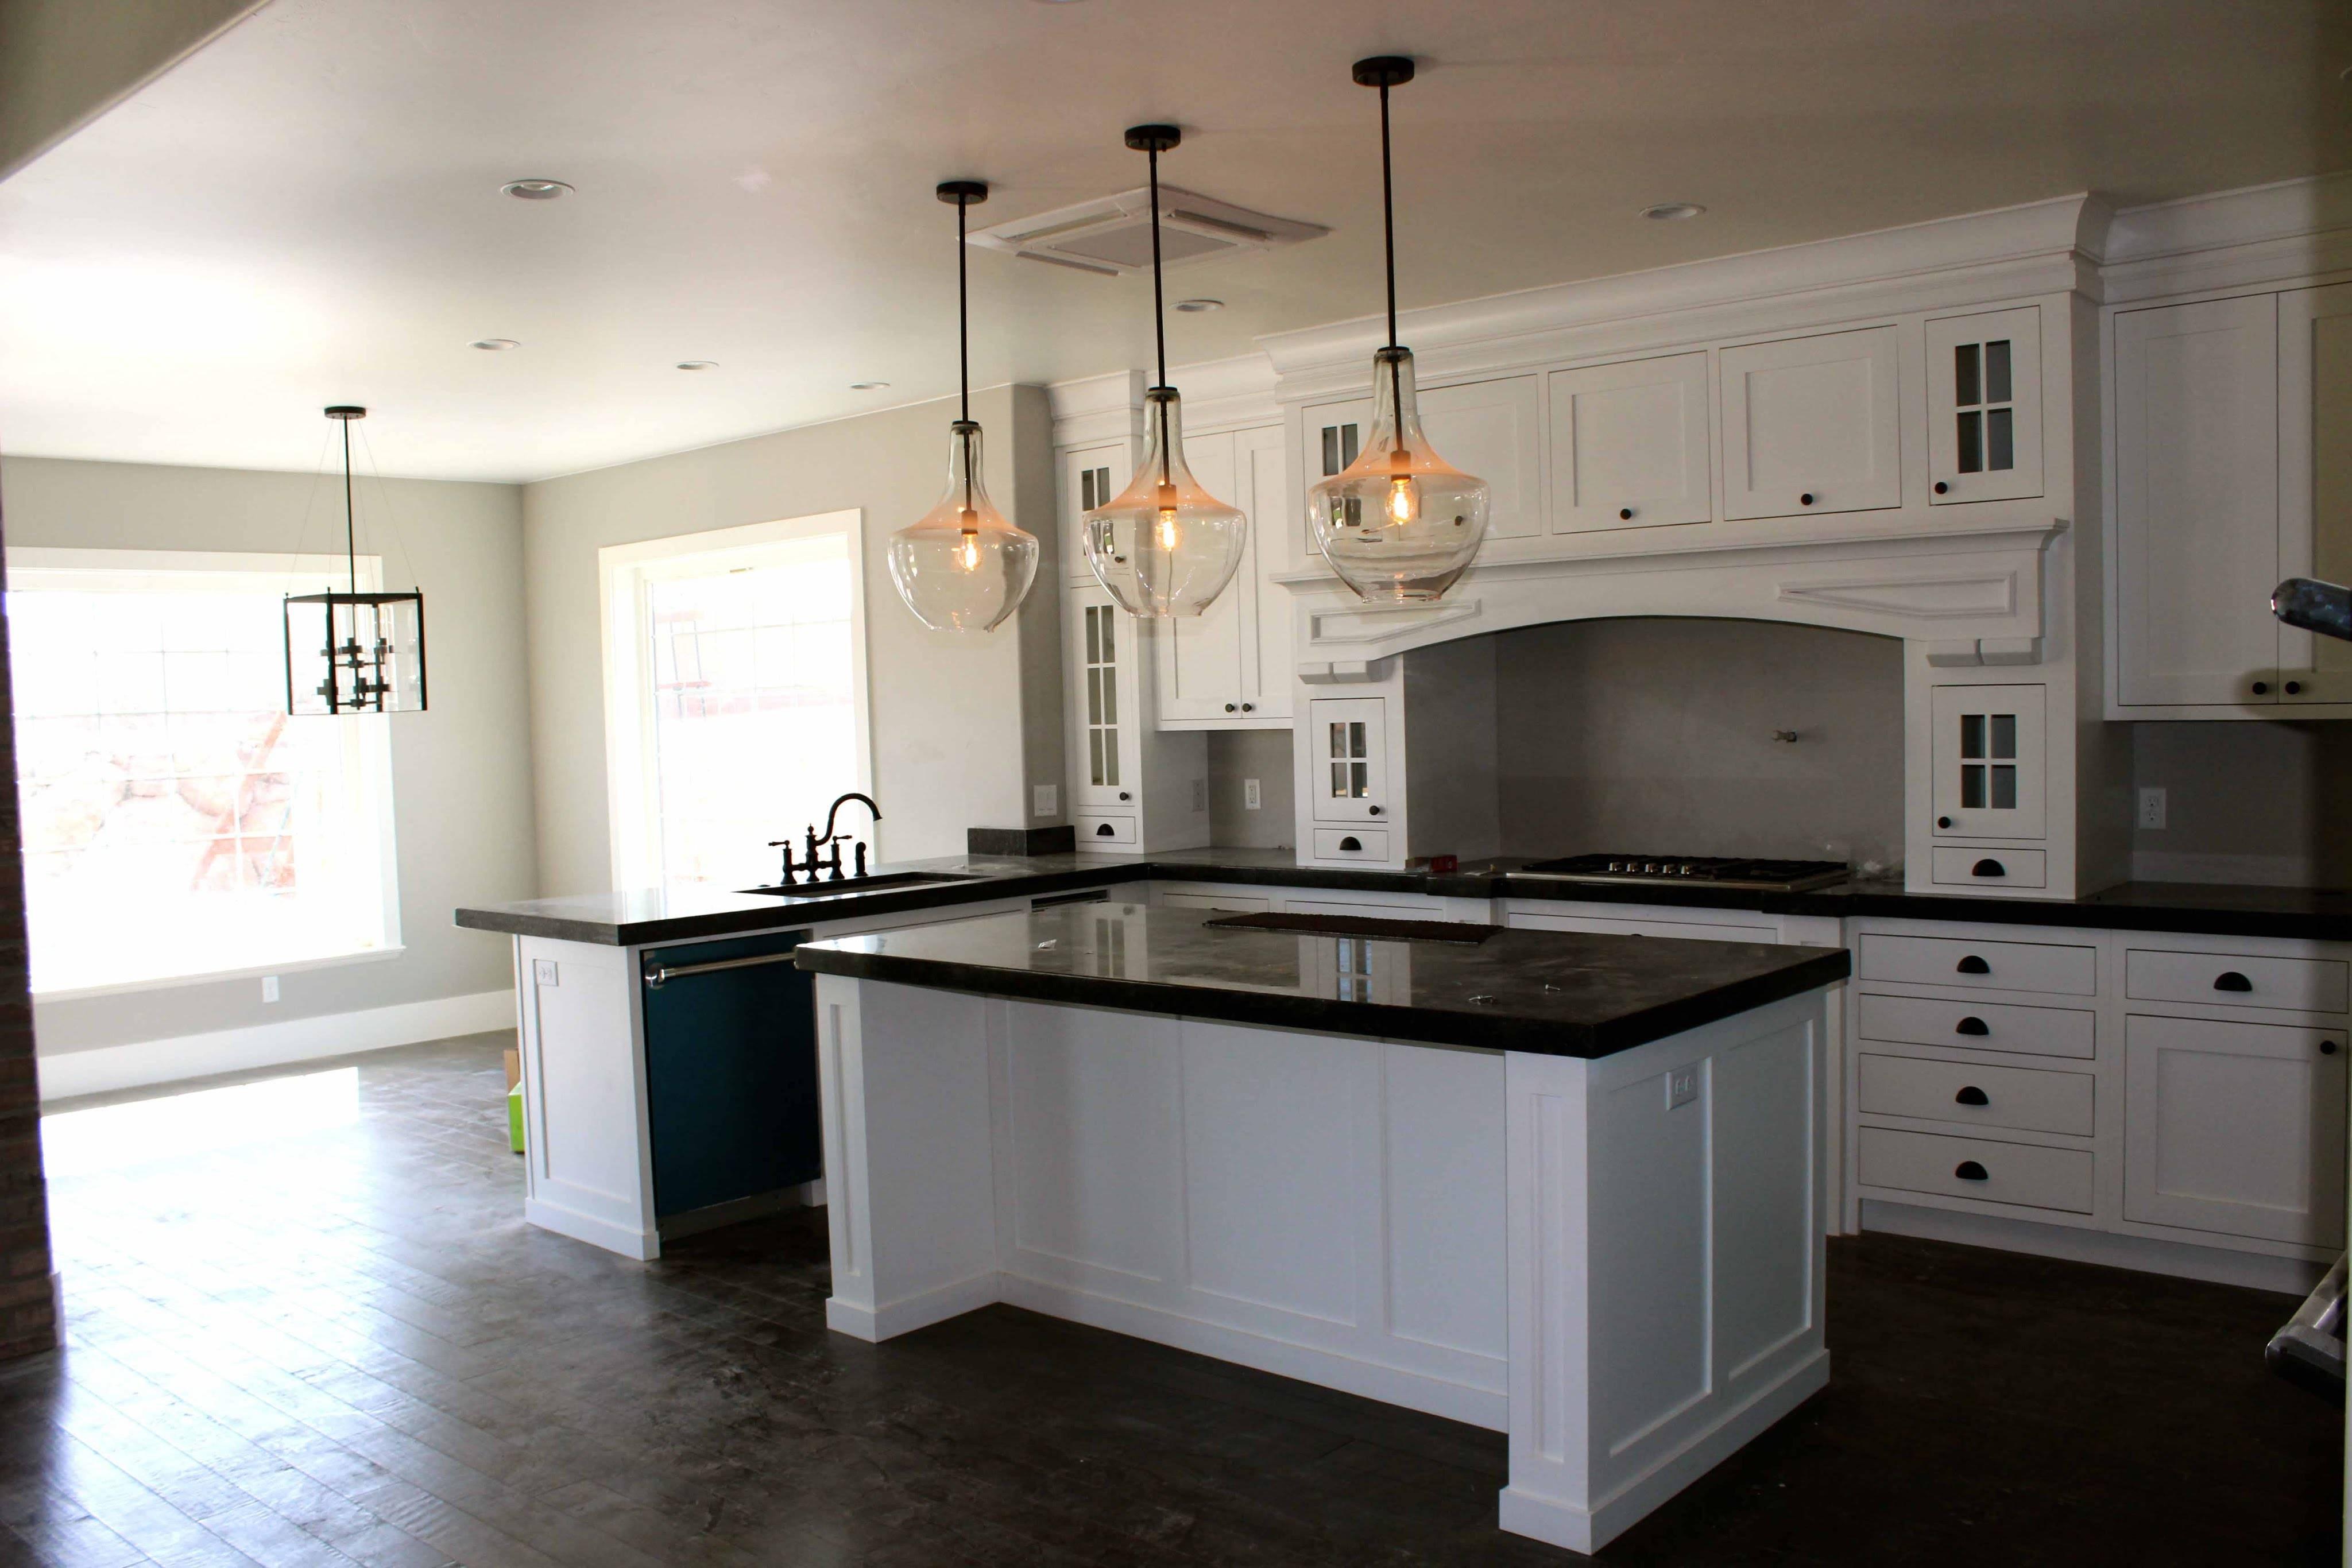 Kitchen Pendant Lighting | Pendant Lighting Above Kitchen Sink For Kitchen Pendant Lighting (View 2 of 15)